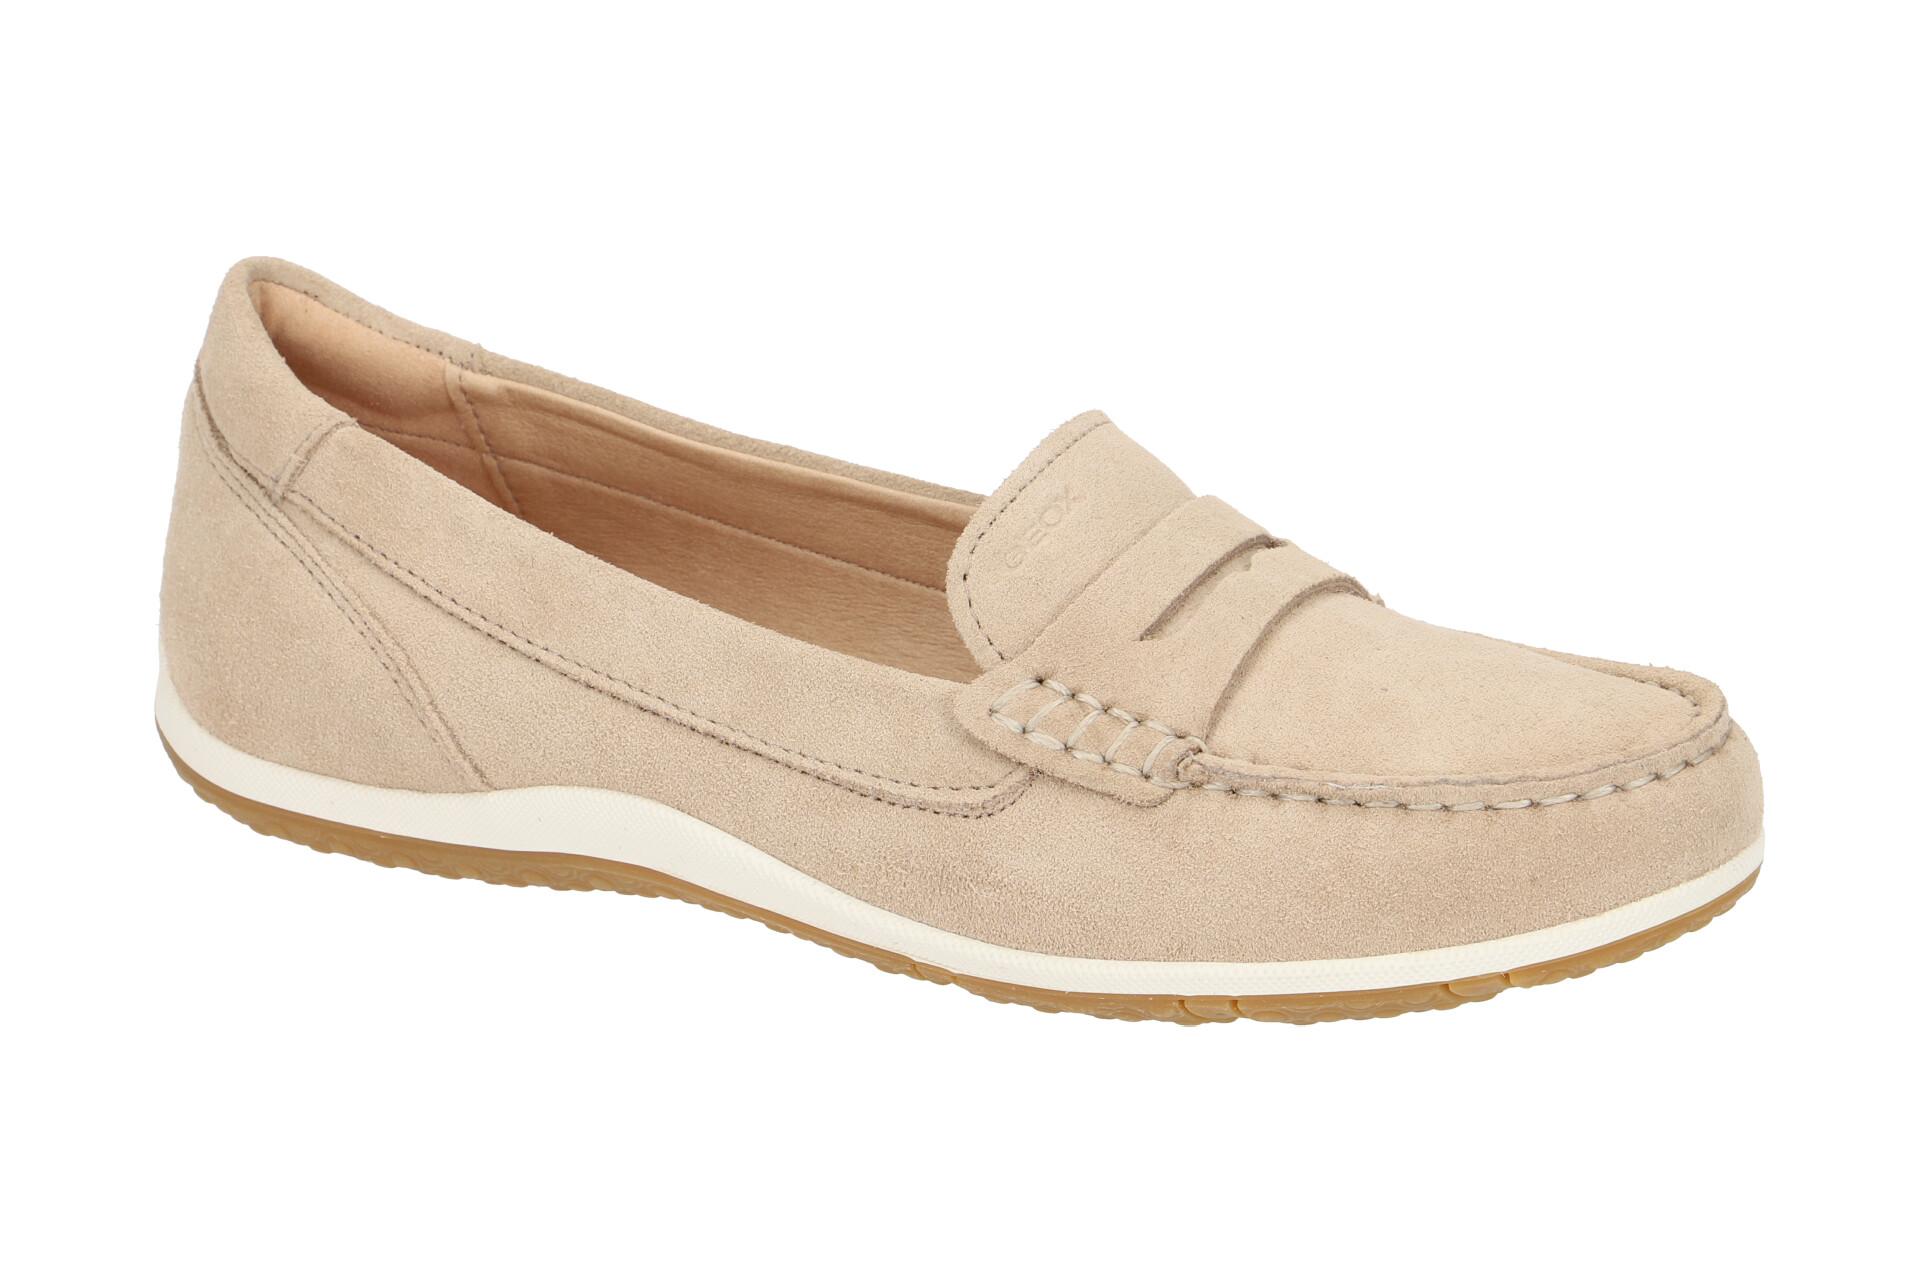 Geox Vega Damen Mokassin Schuhe pink D92dna Geox in 2020